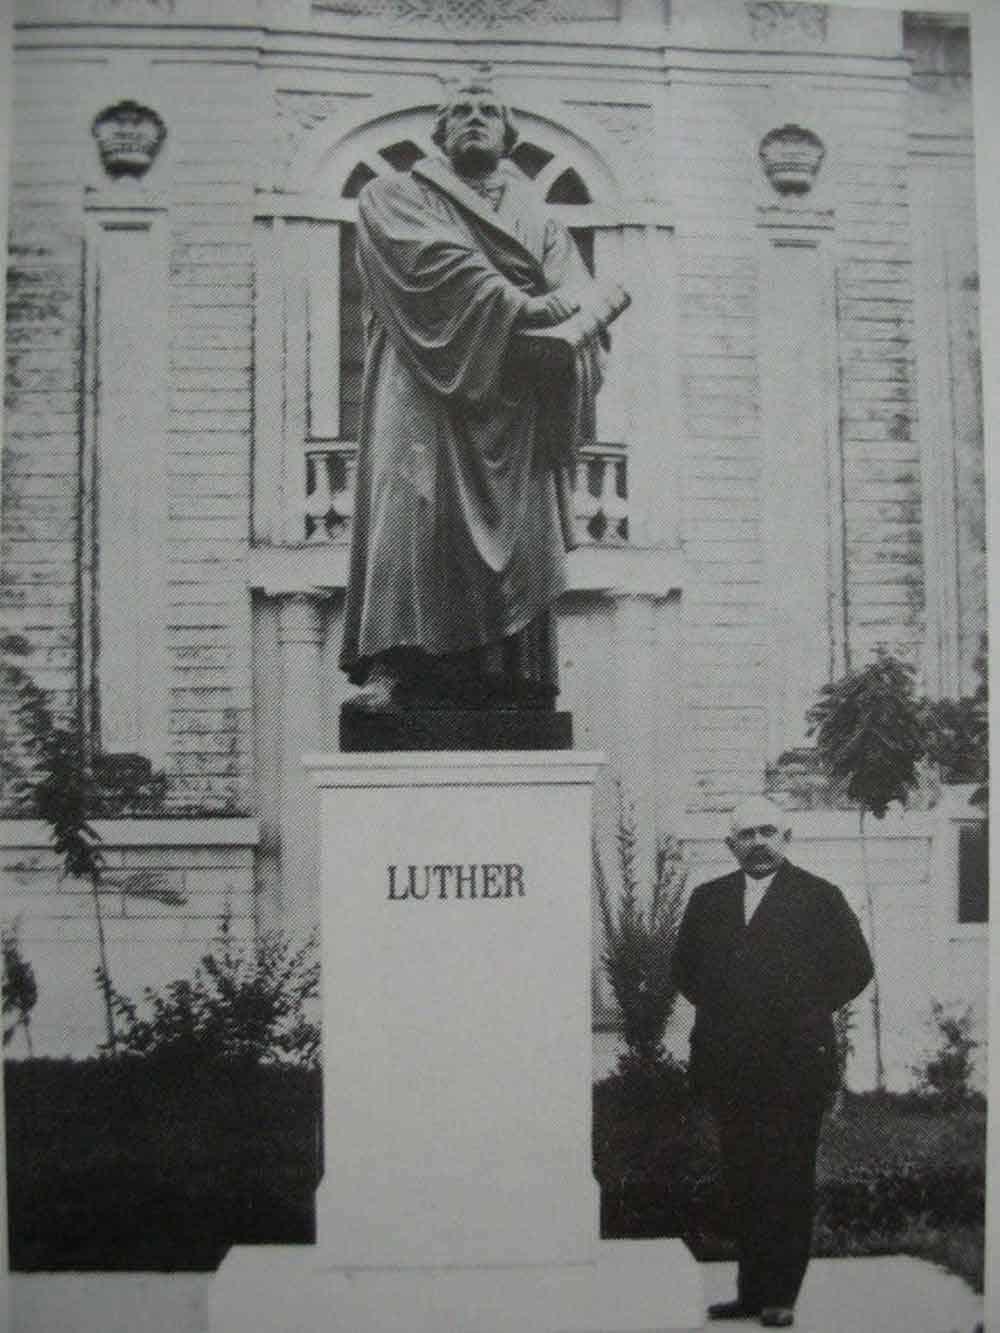 VRBAS TRIDESETIH GODINA 20. VEKA: Spomenik Martinu Luteru